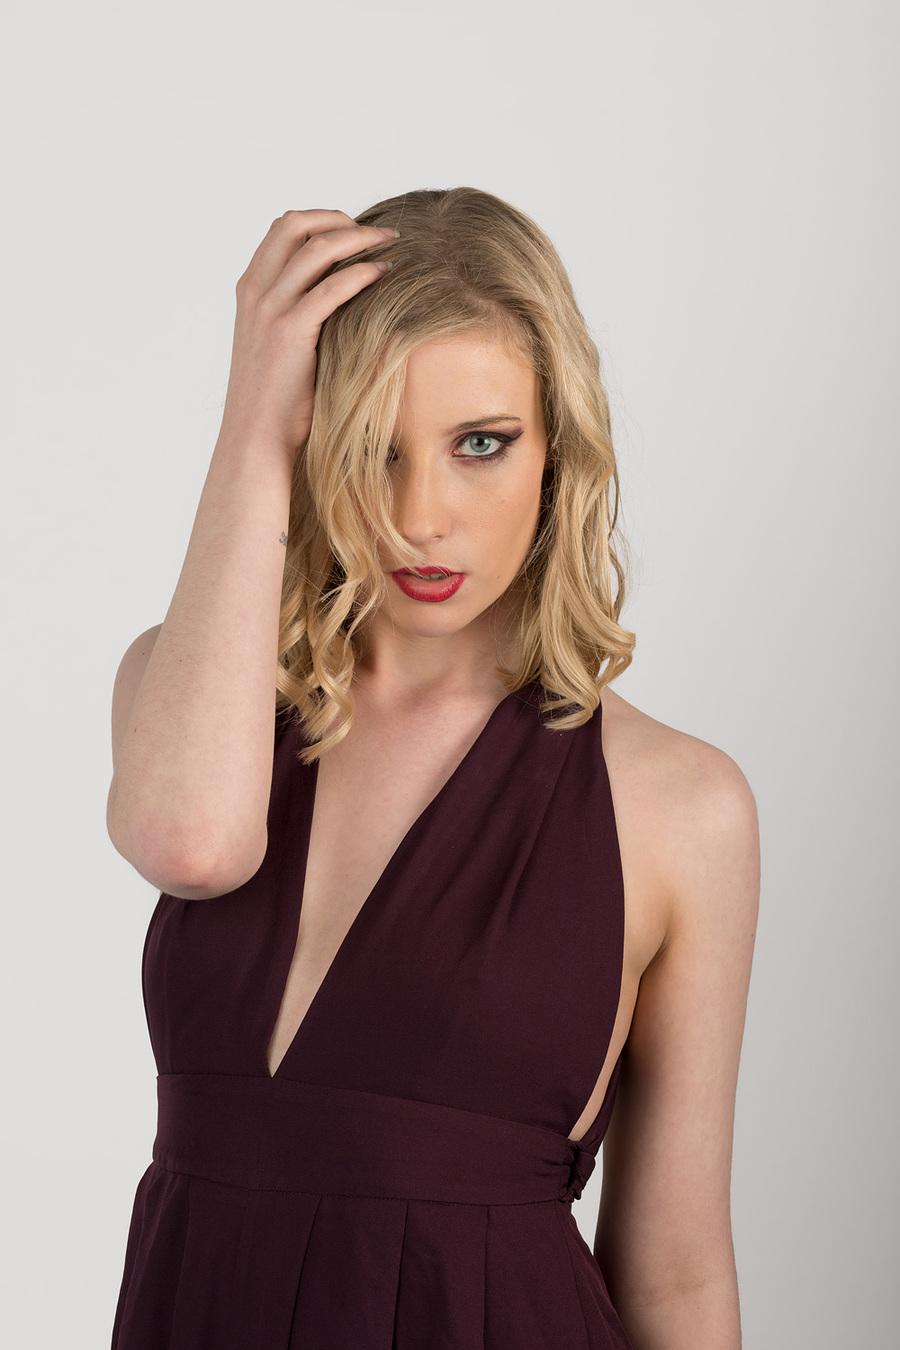 Kate In Purple / Photography by Brian Brogan, Model Kate Laura, Taken at Brian Brogan / Uploaded 26th April 2016 @ 09:32 PM